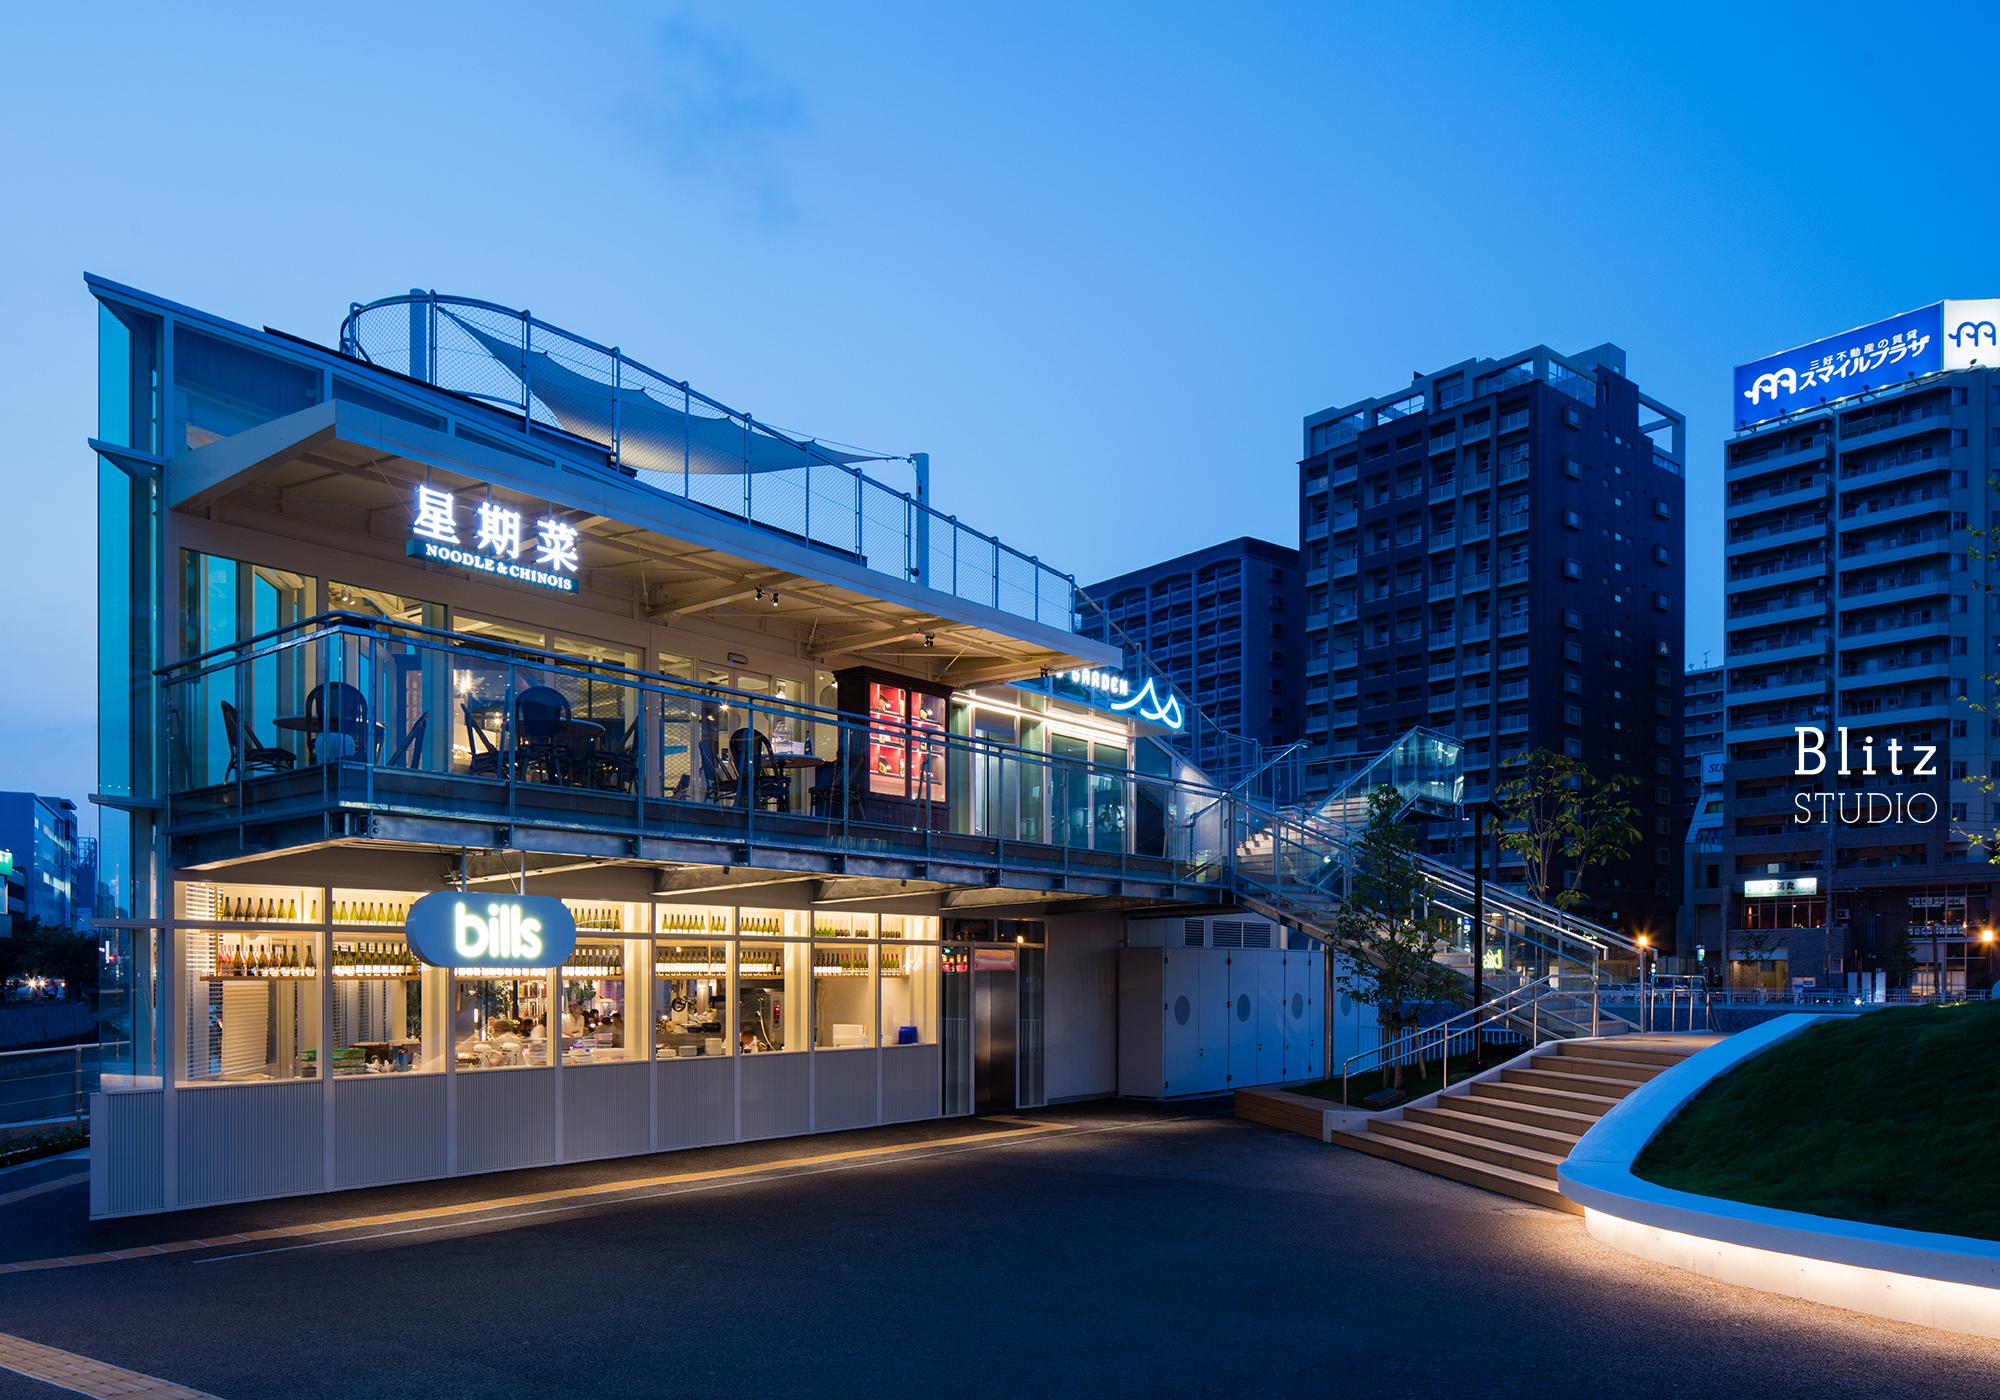 『星期菜 NOODLE & CHINOIS』-福岡県福岡市-建築写真・竣工写真・インテリア写真2